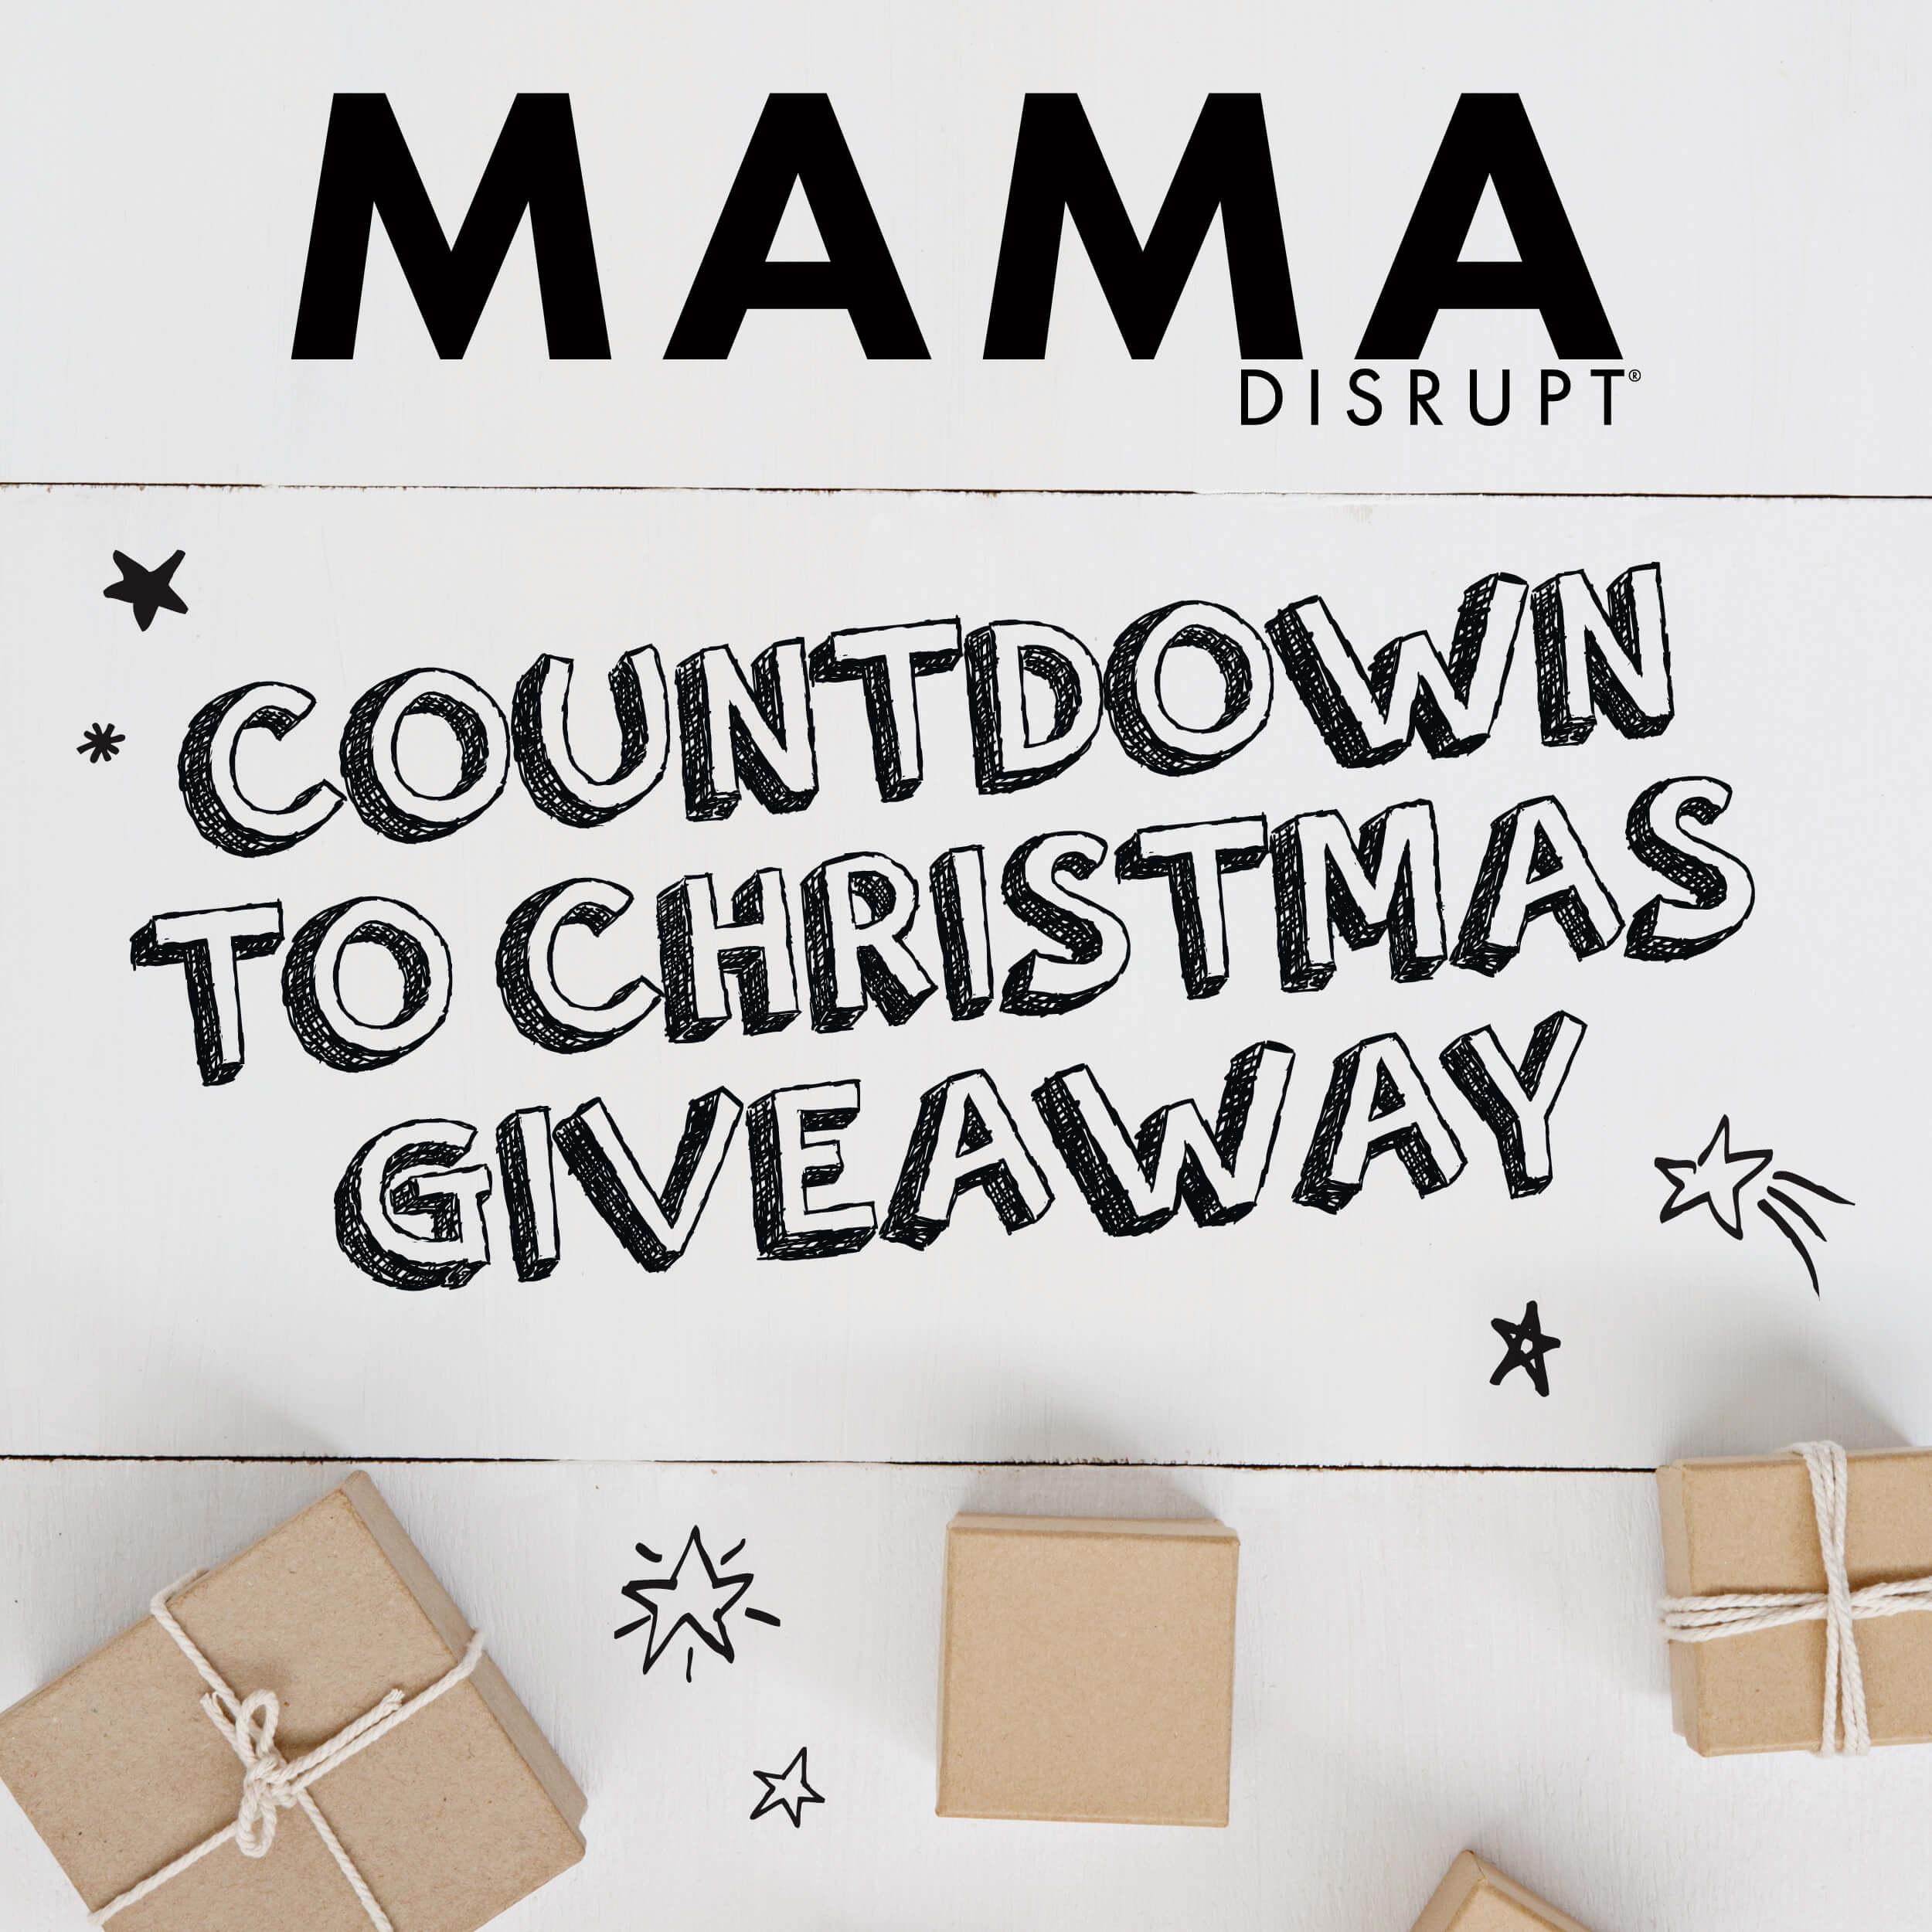 Mama Disrupt® Countdown to Christmas Giveaway